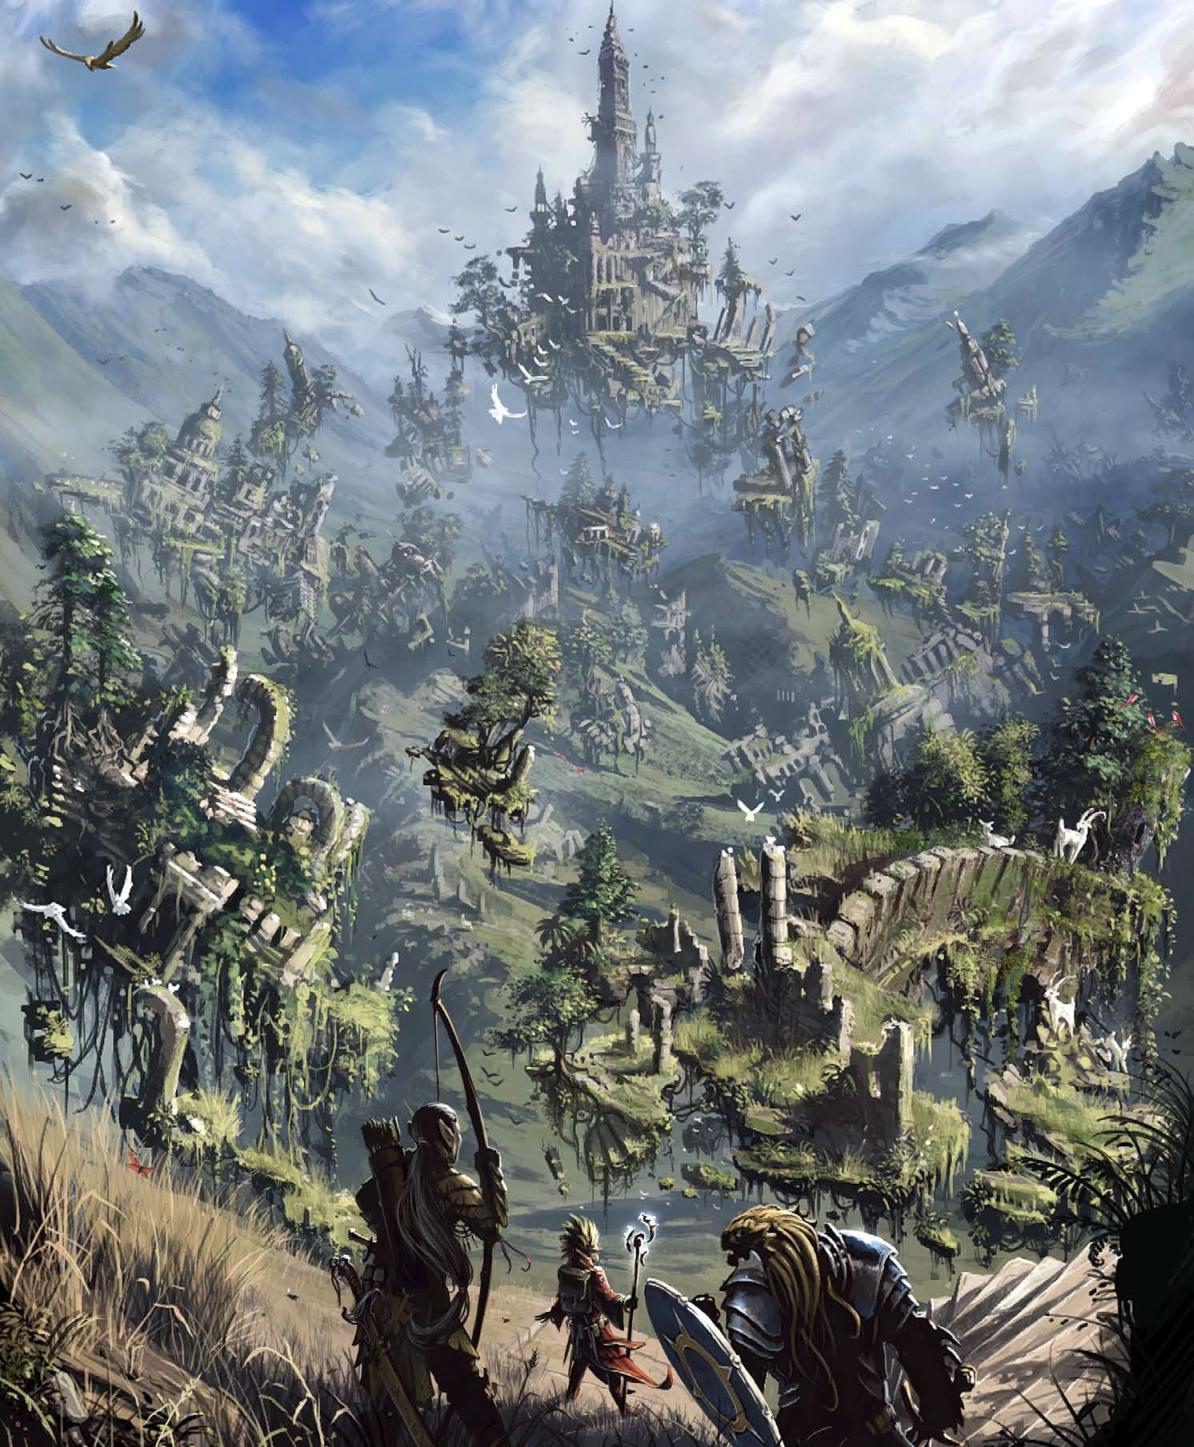 Warriors Of The Rainbow Online Subtitrat Hd: Castle (Fantasy Wallpaper